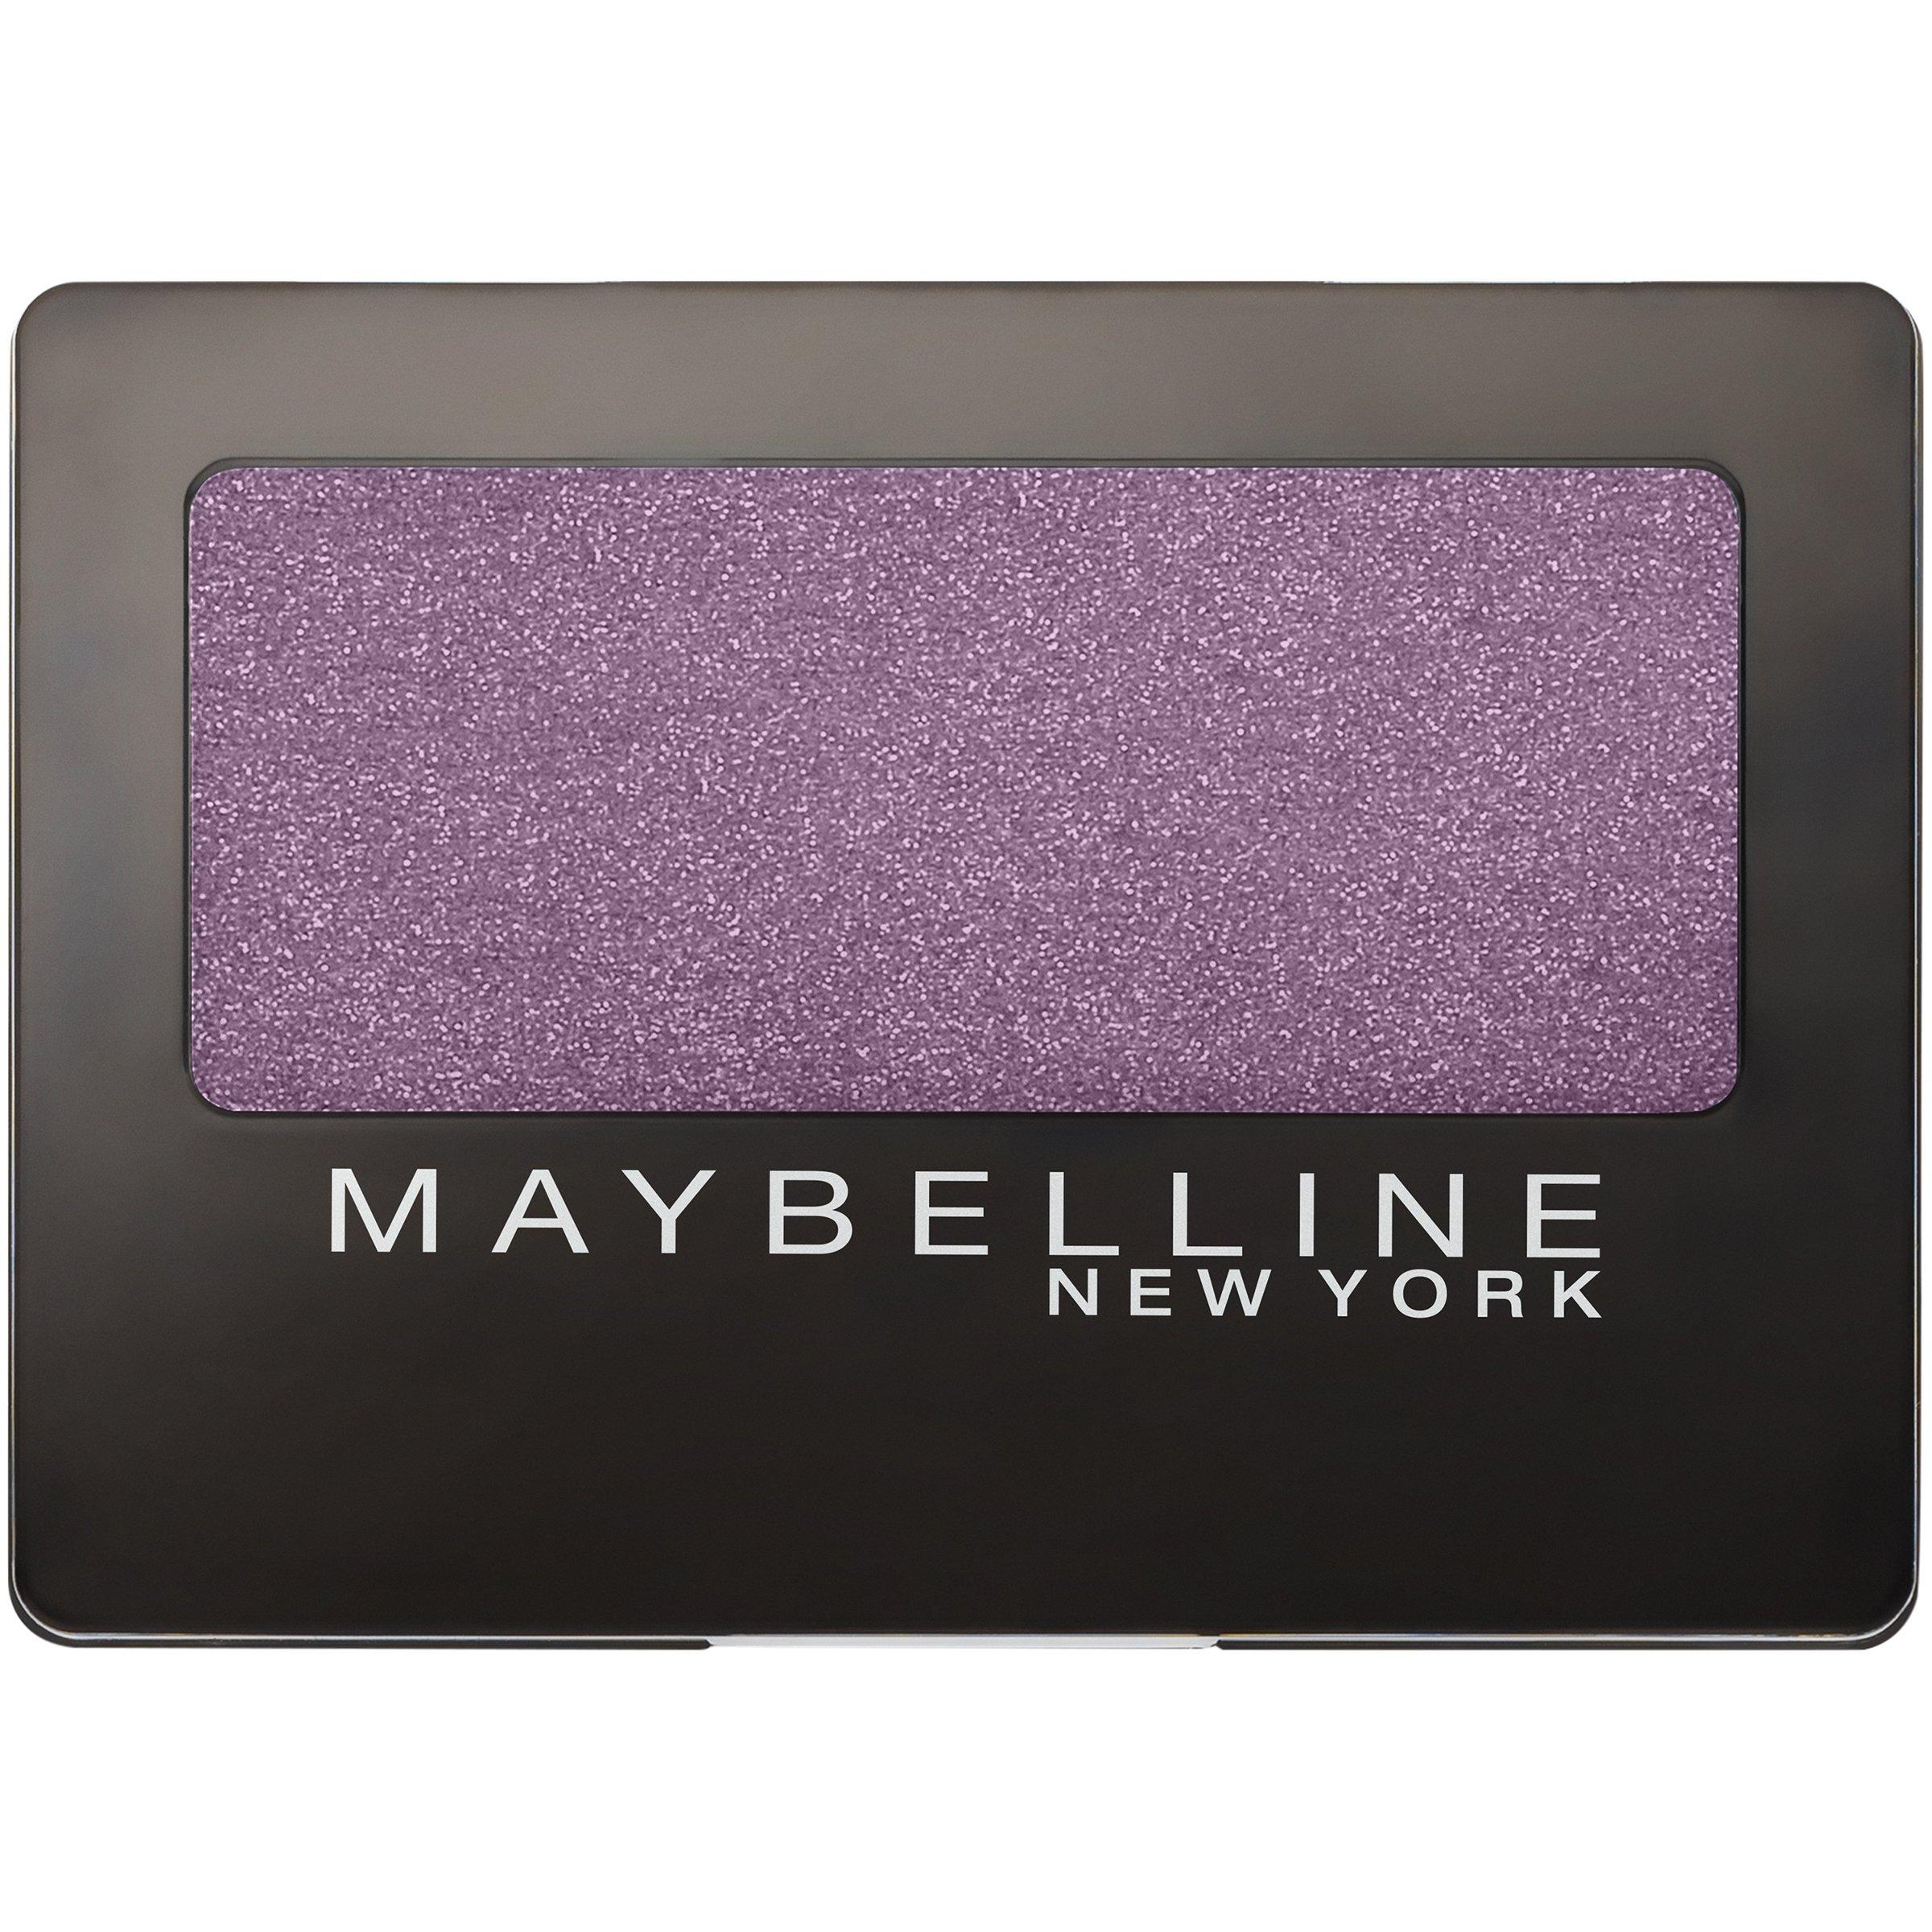 Maybelline New York Expert Wear Eyeshadow, Humdrum Plum, 0.08 oz.